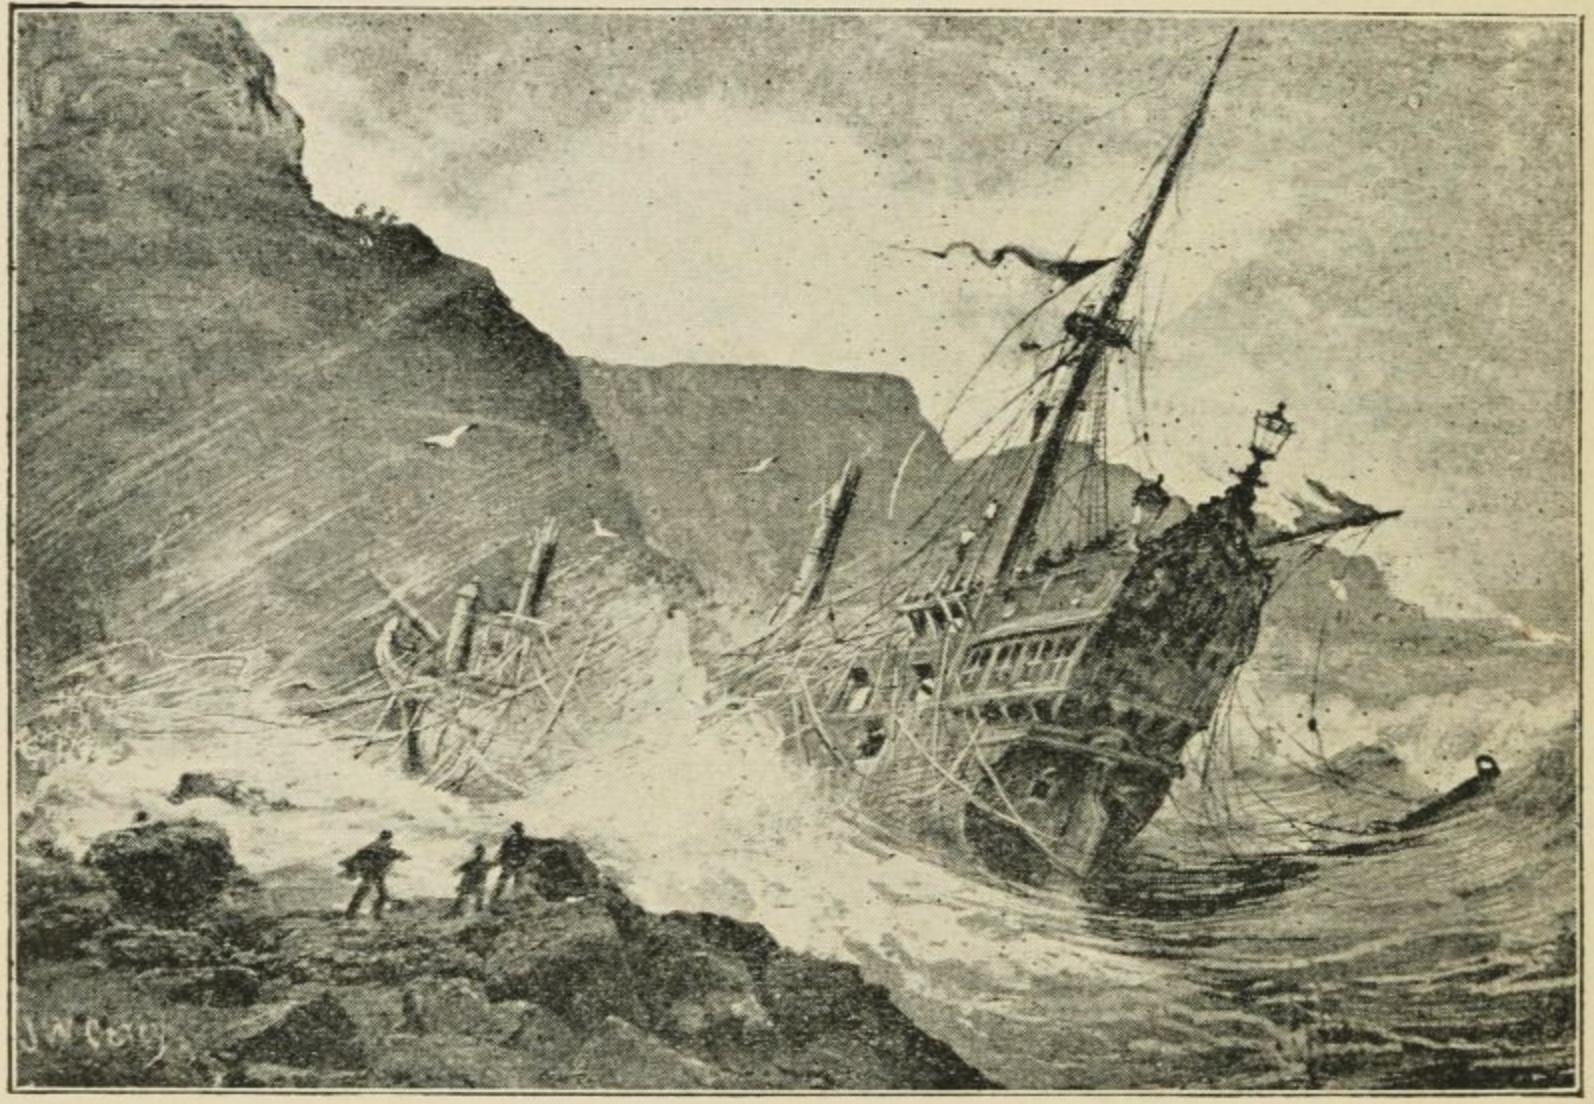 File:Spanish Galleon shipwreck at Port-Na Spaniagh 1588.jpg ...